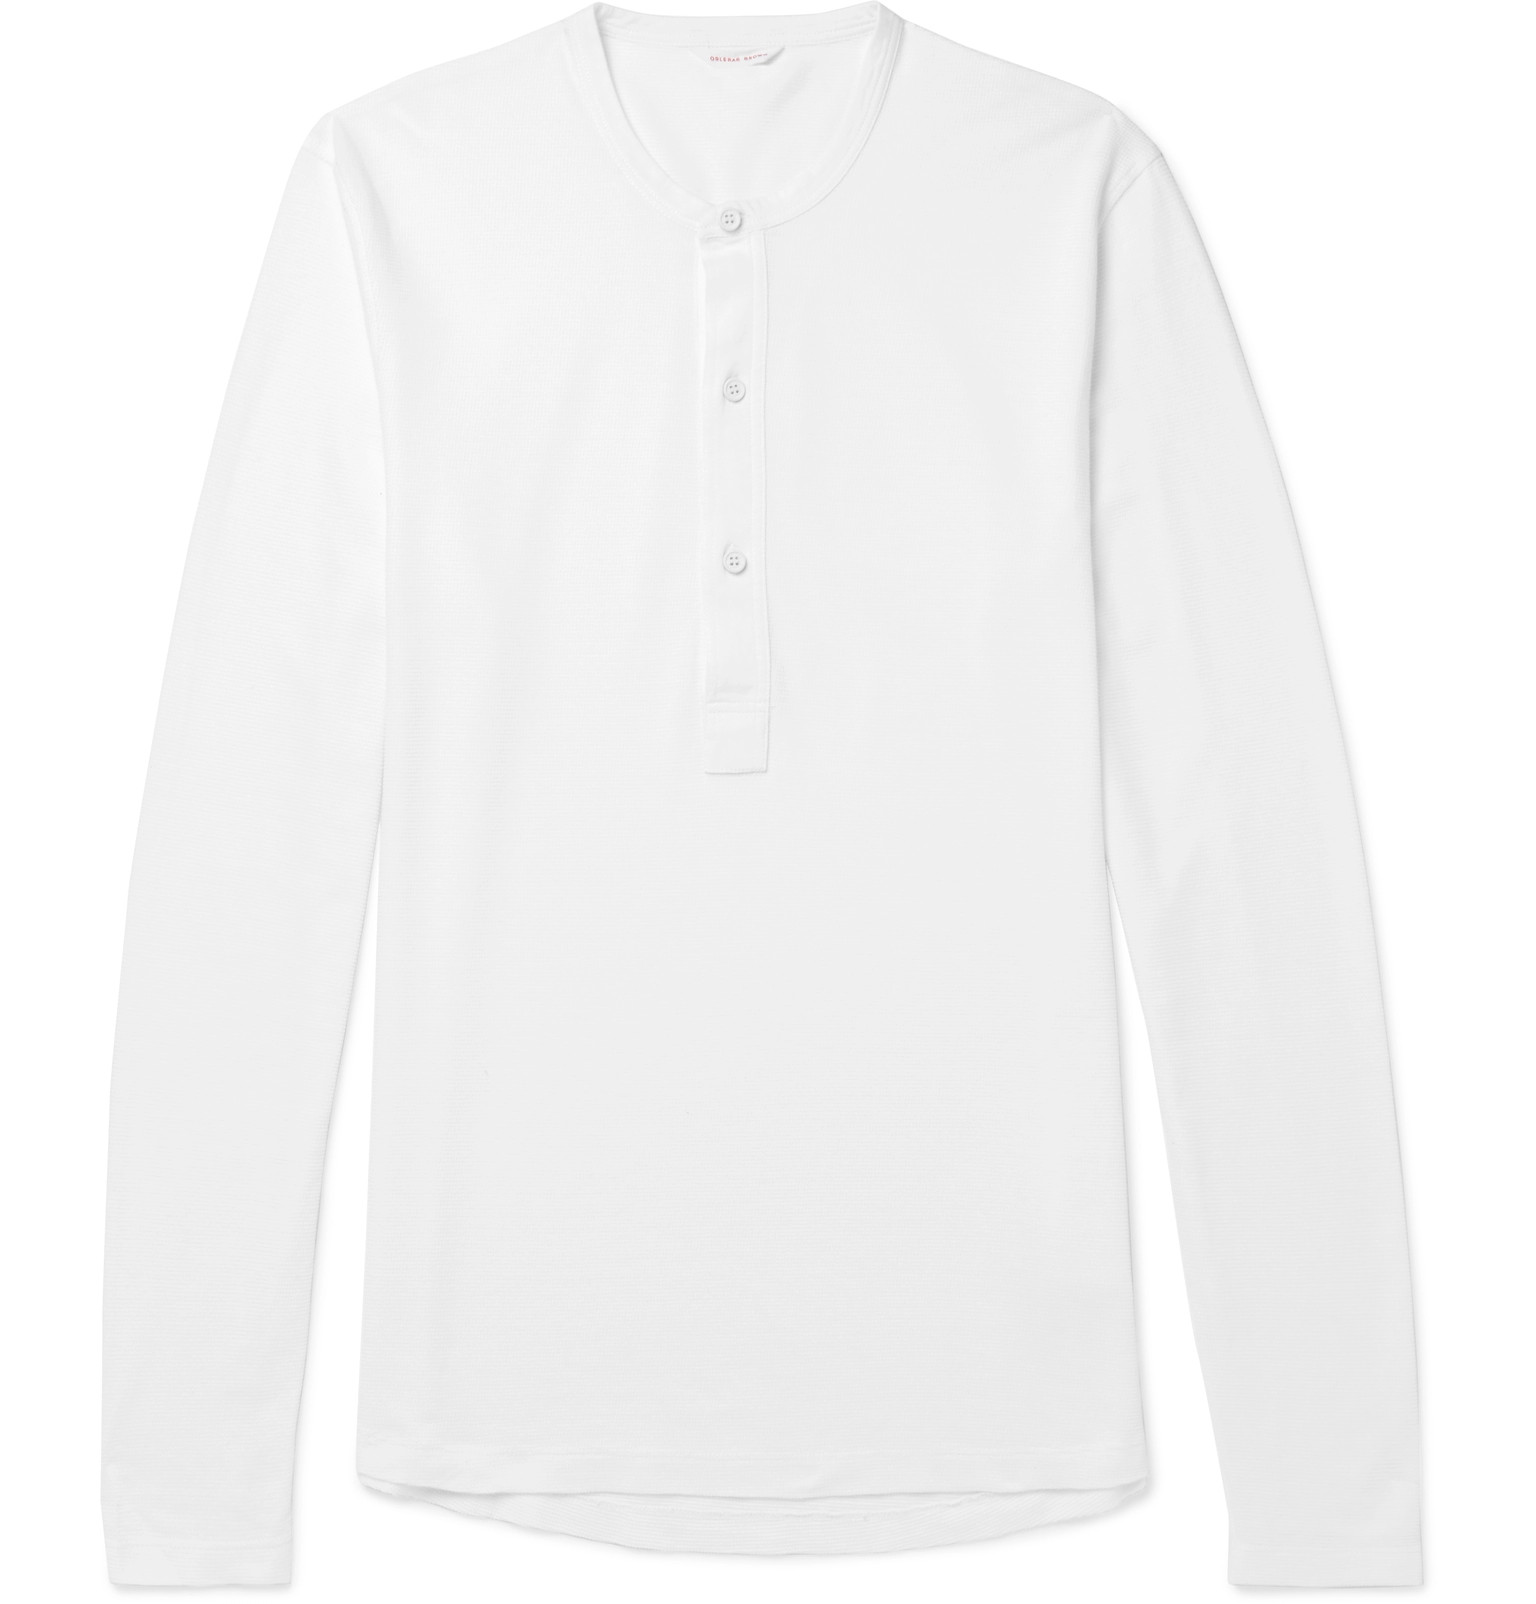 Orlebar Brown Craine Slim-fit Waffle-knit Cotton-jersey Henley T-shirt - White TdeXa2HrP